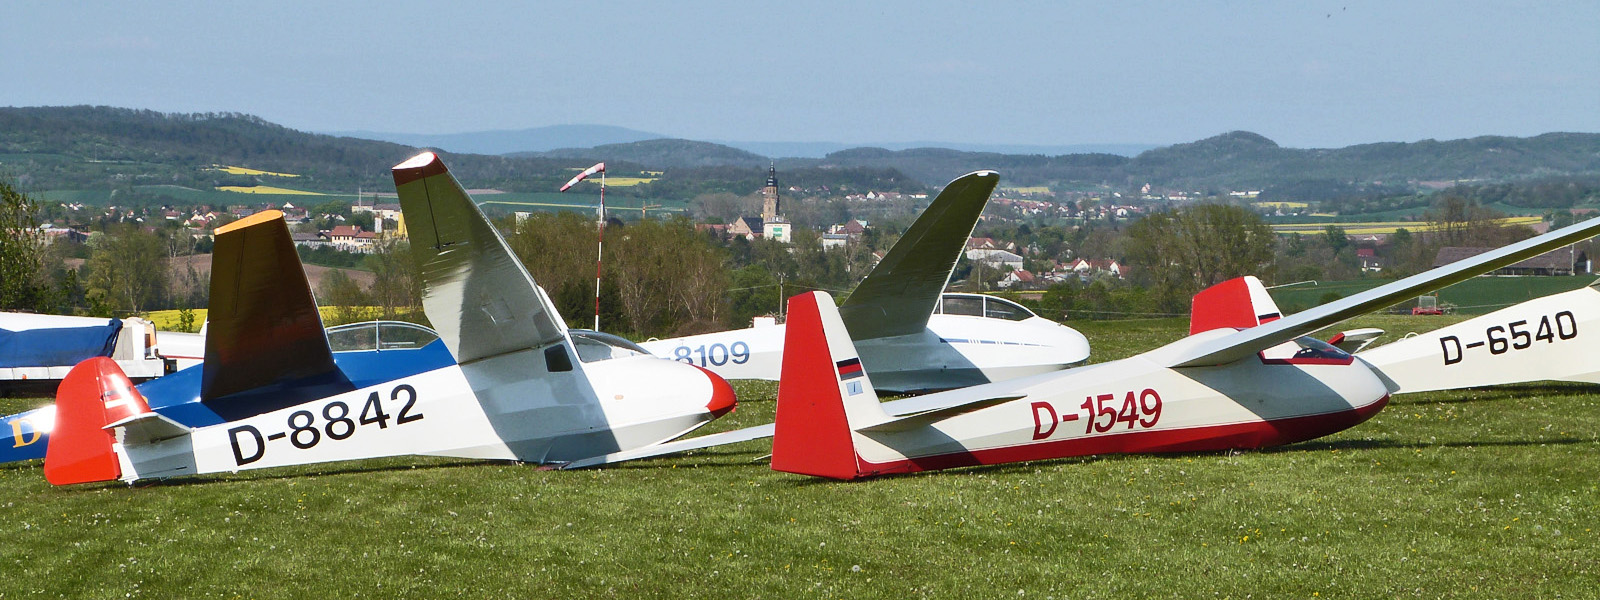 kopf gruppe - Flugzeuge